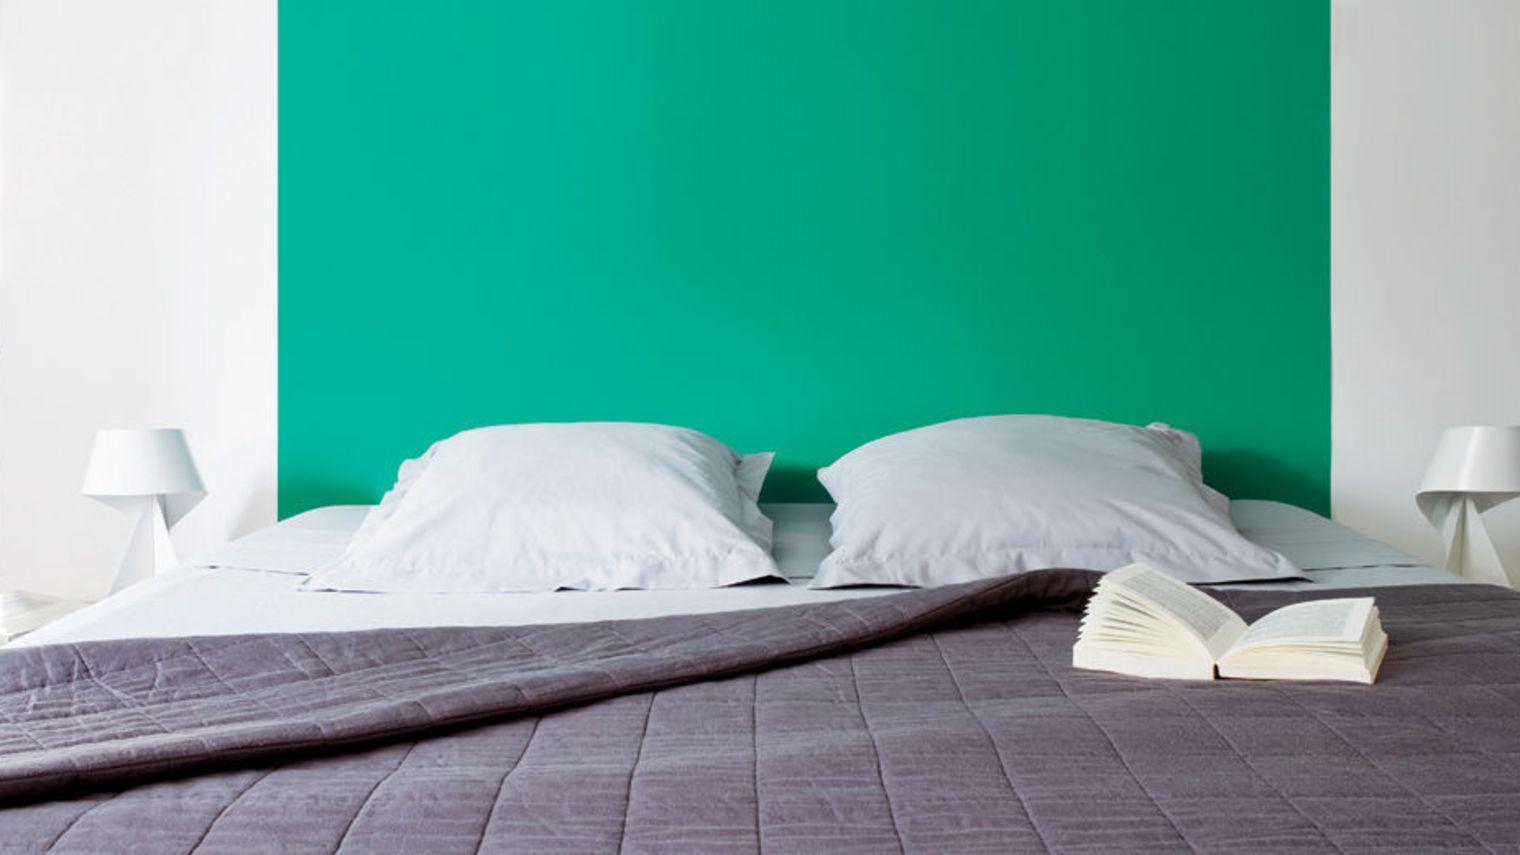 Déco chambre vert emeraude  Exemples d'aménagements